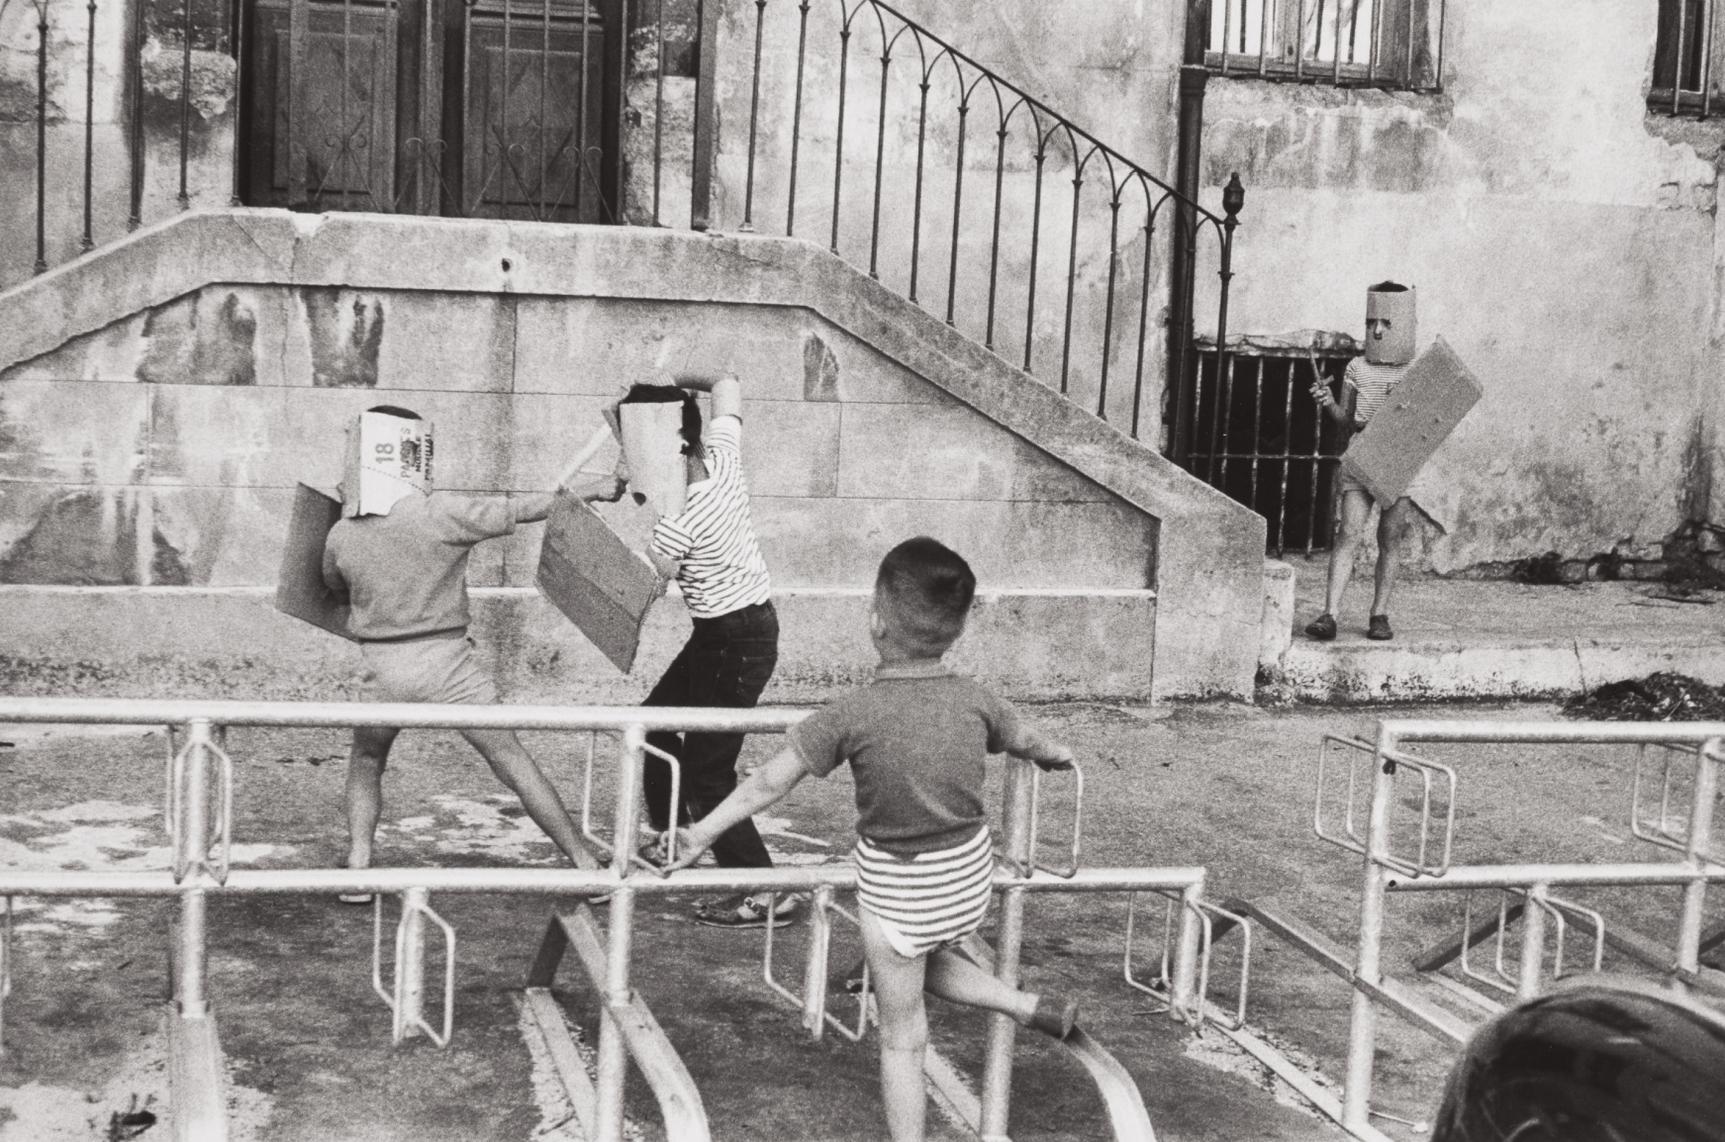 Henri Cartier-Bresson-Mardi Gras, Tarascon, Bouches-Du-Rhone-1959